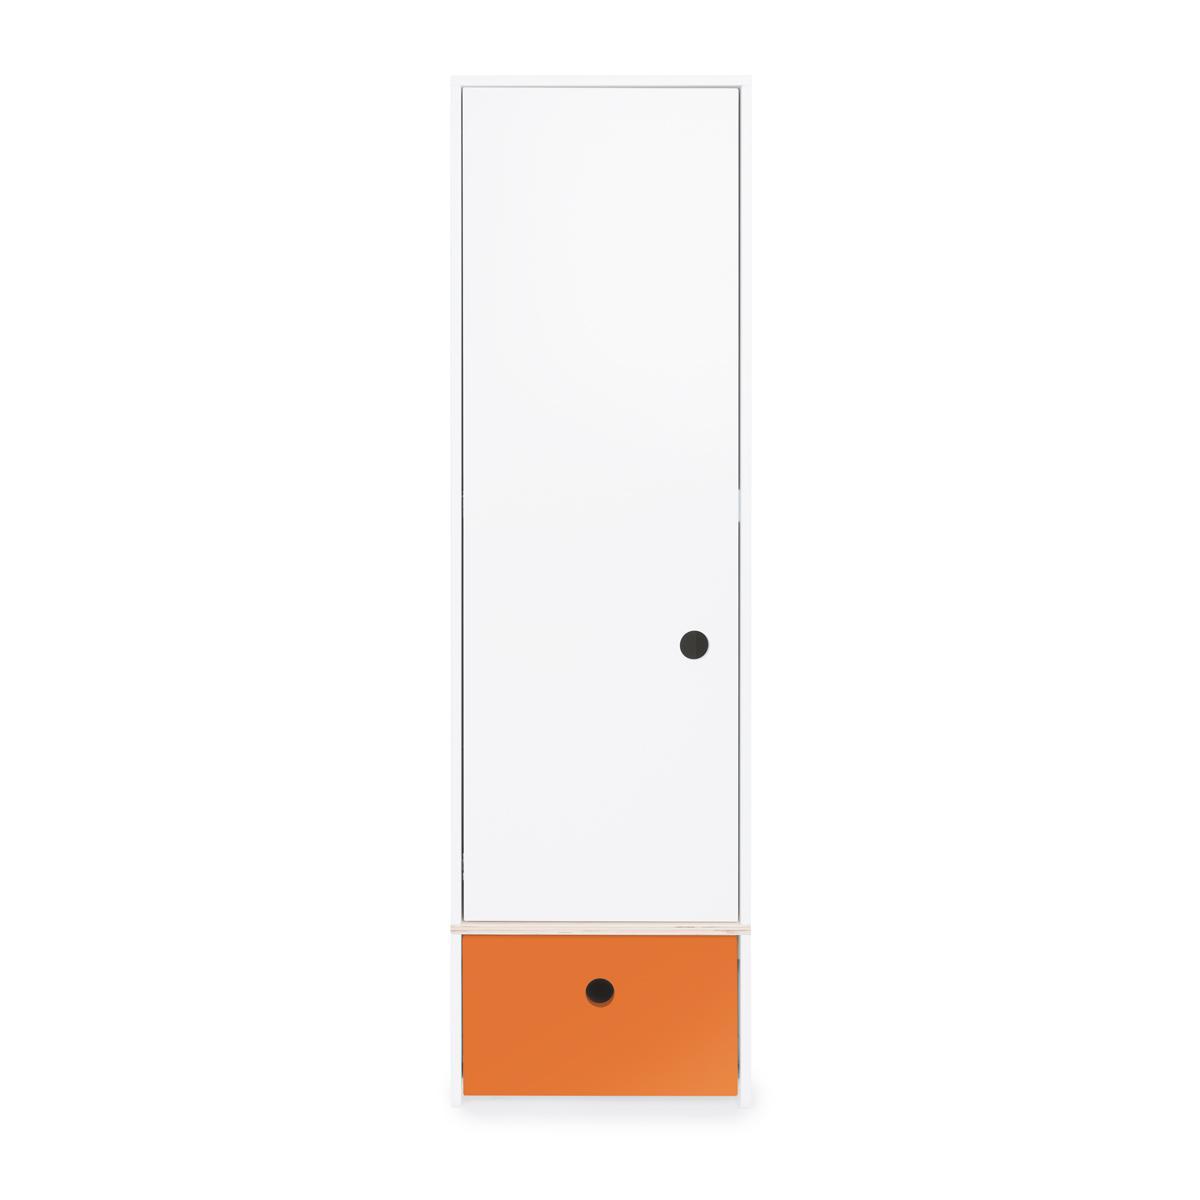 Armoire 1 porte façade tiroir orange